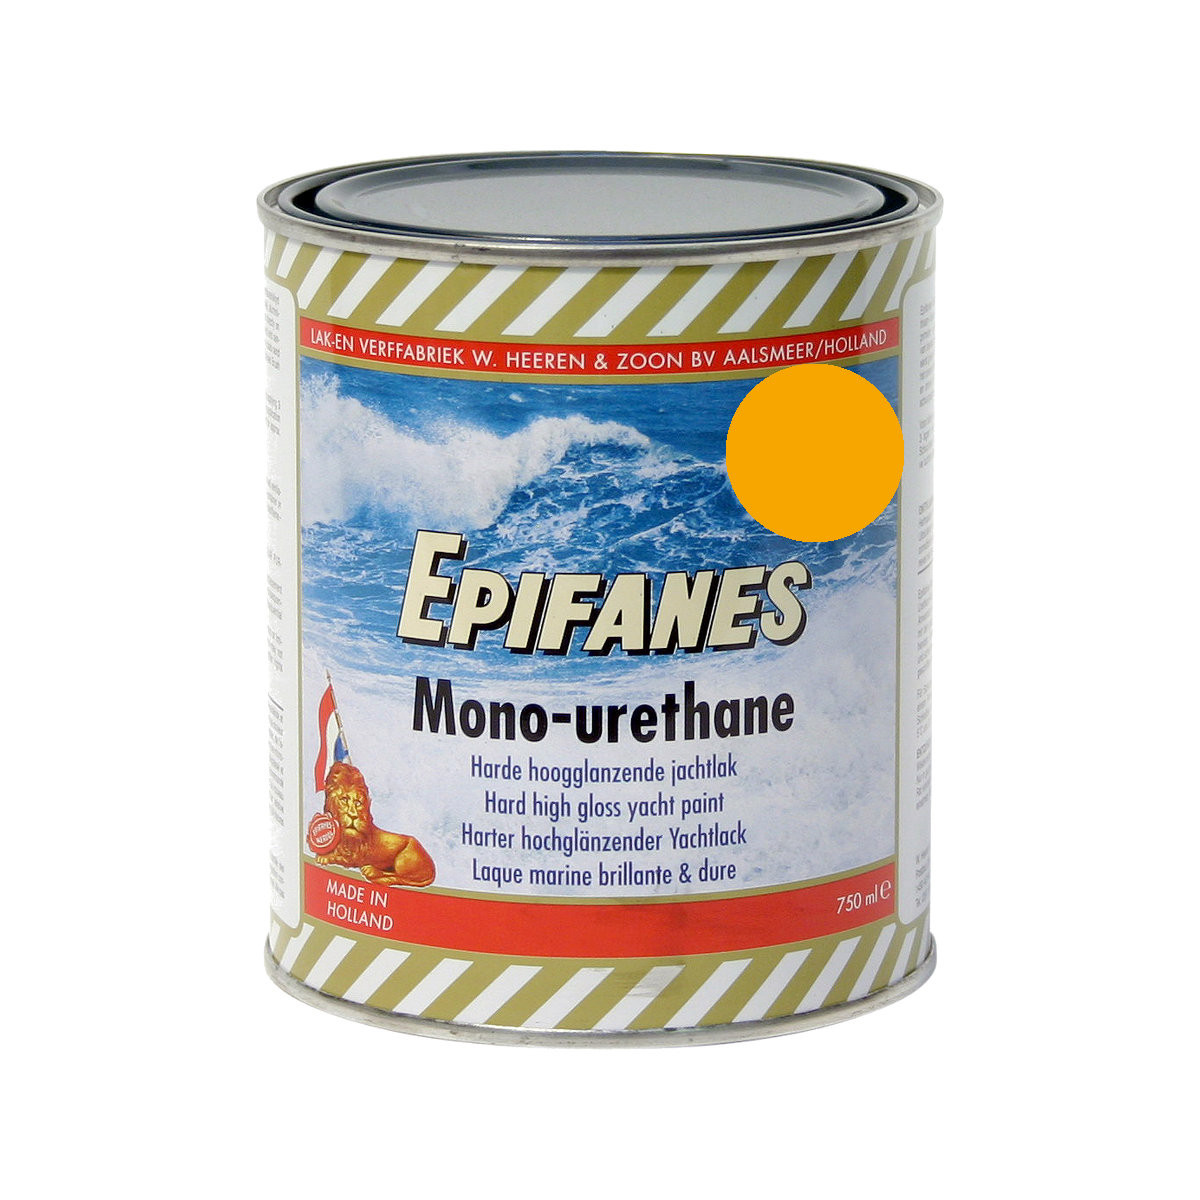 Epifanes mono-urethane jachtlak - geel 3137, 750ml